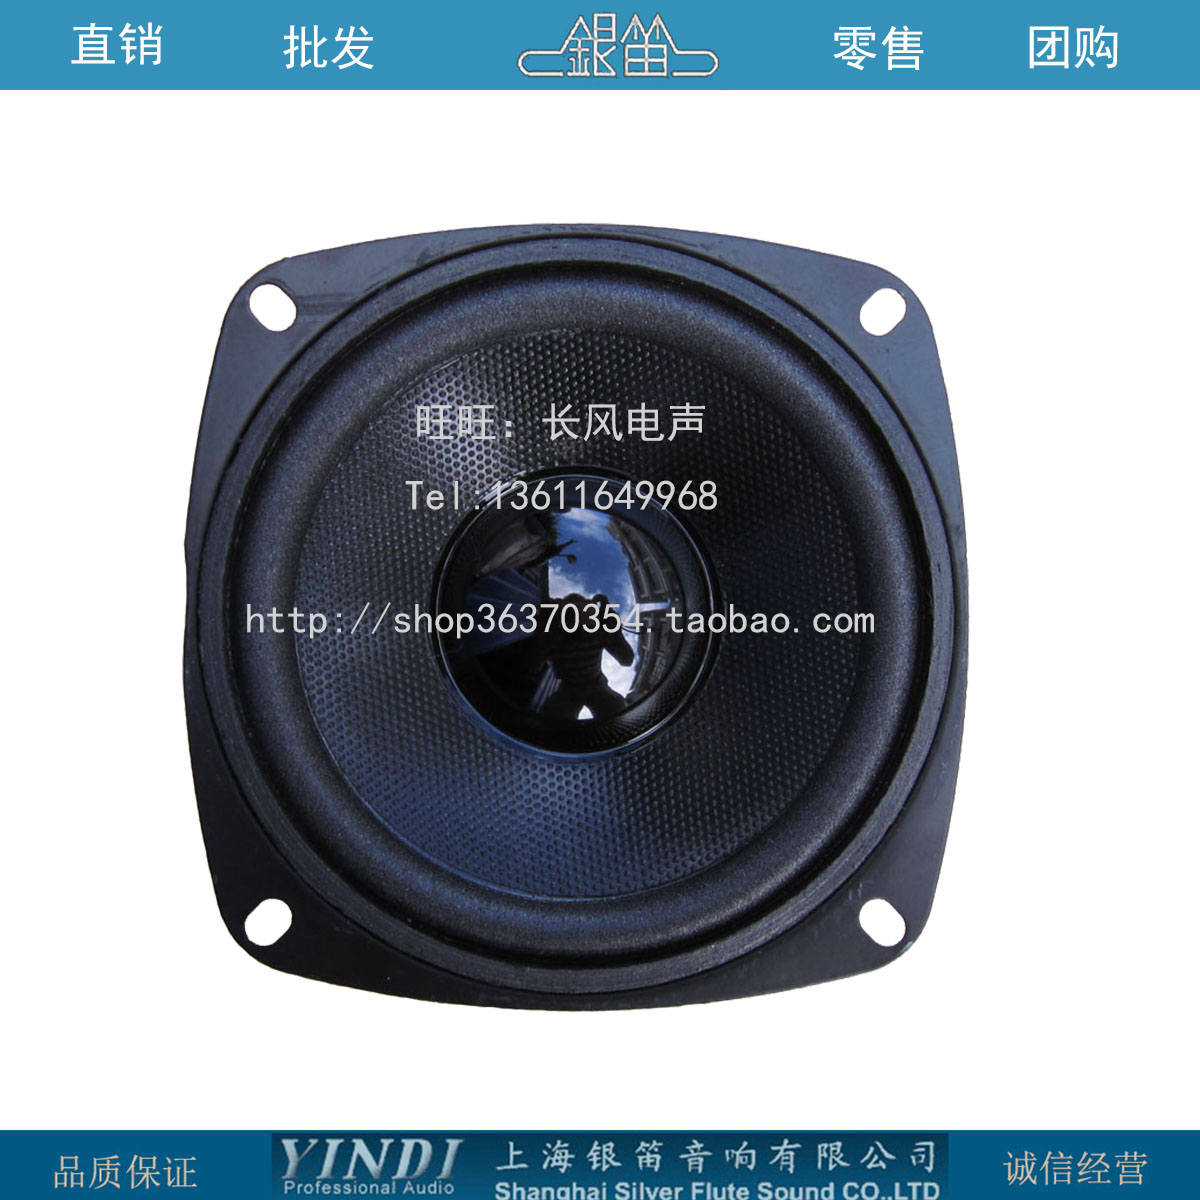 автомобильные колонки Shanghai Silver Flute YD106-822P-S shanghai kuaiqin kq 5 multifunctional shoes dryer w deodorization sterilization drying warmth